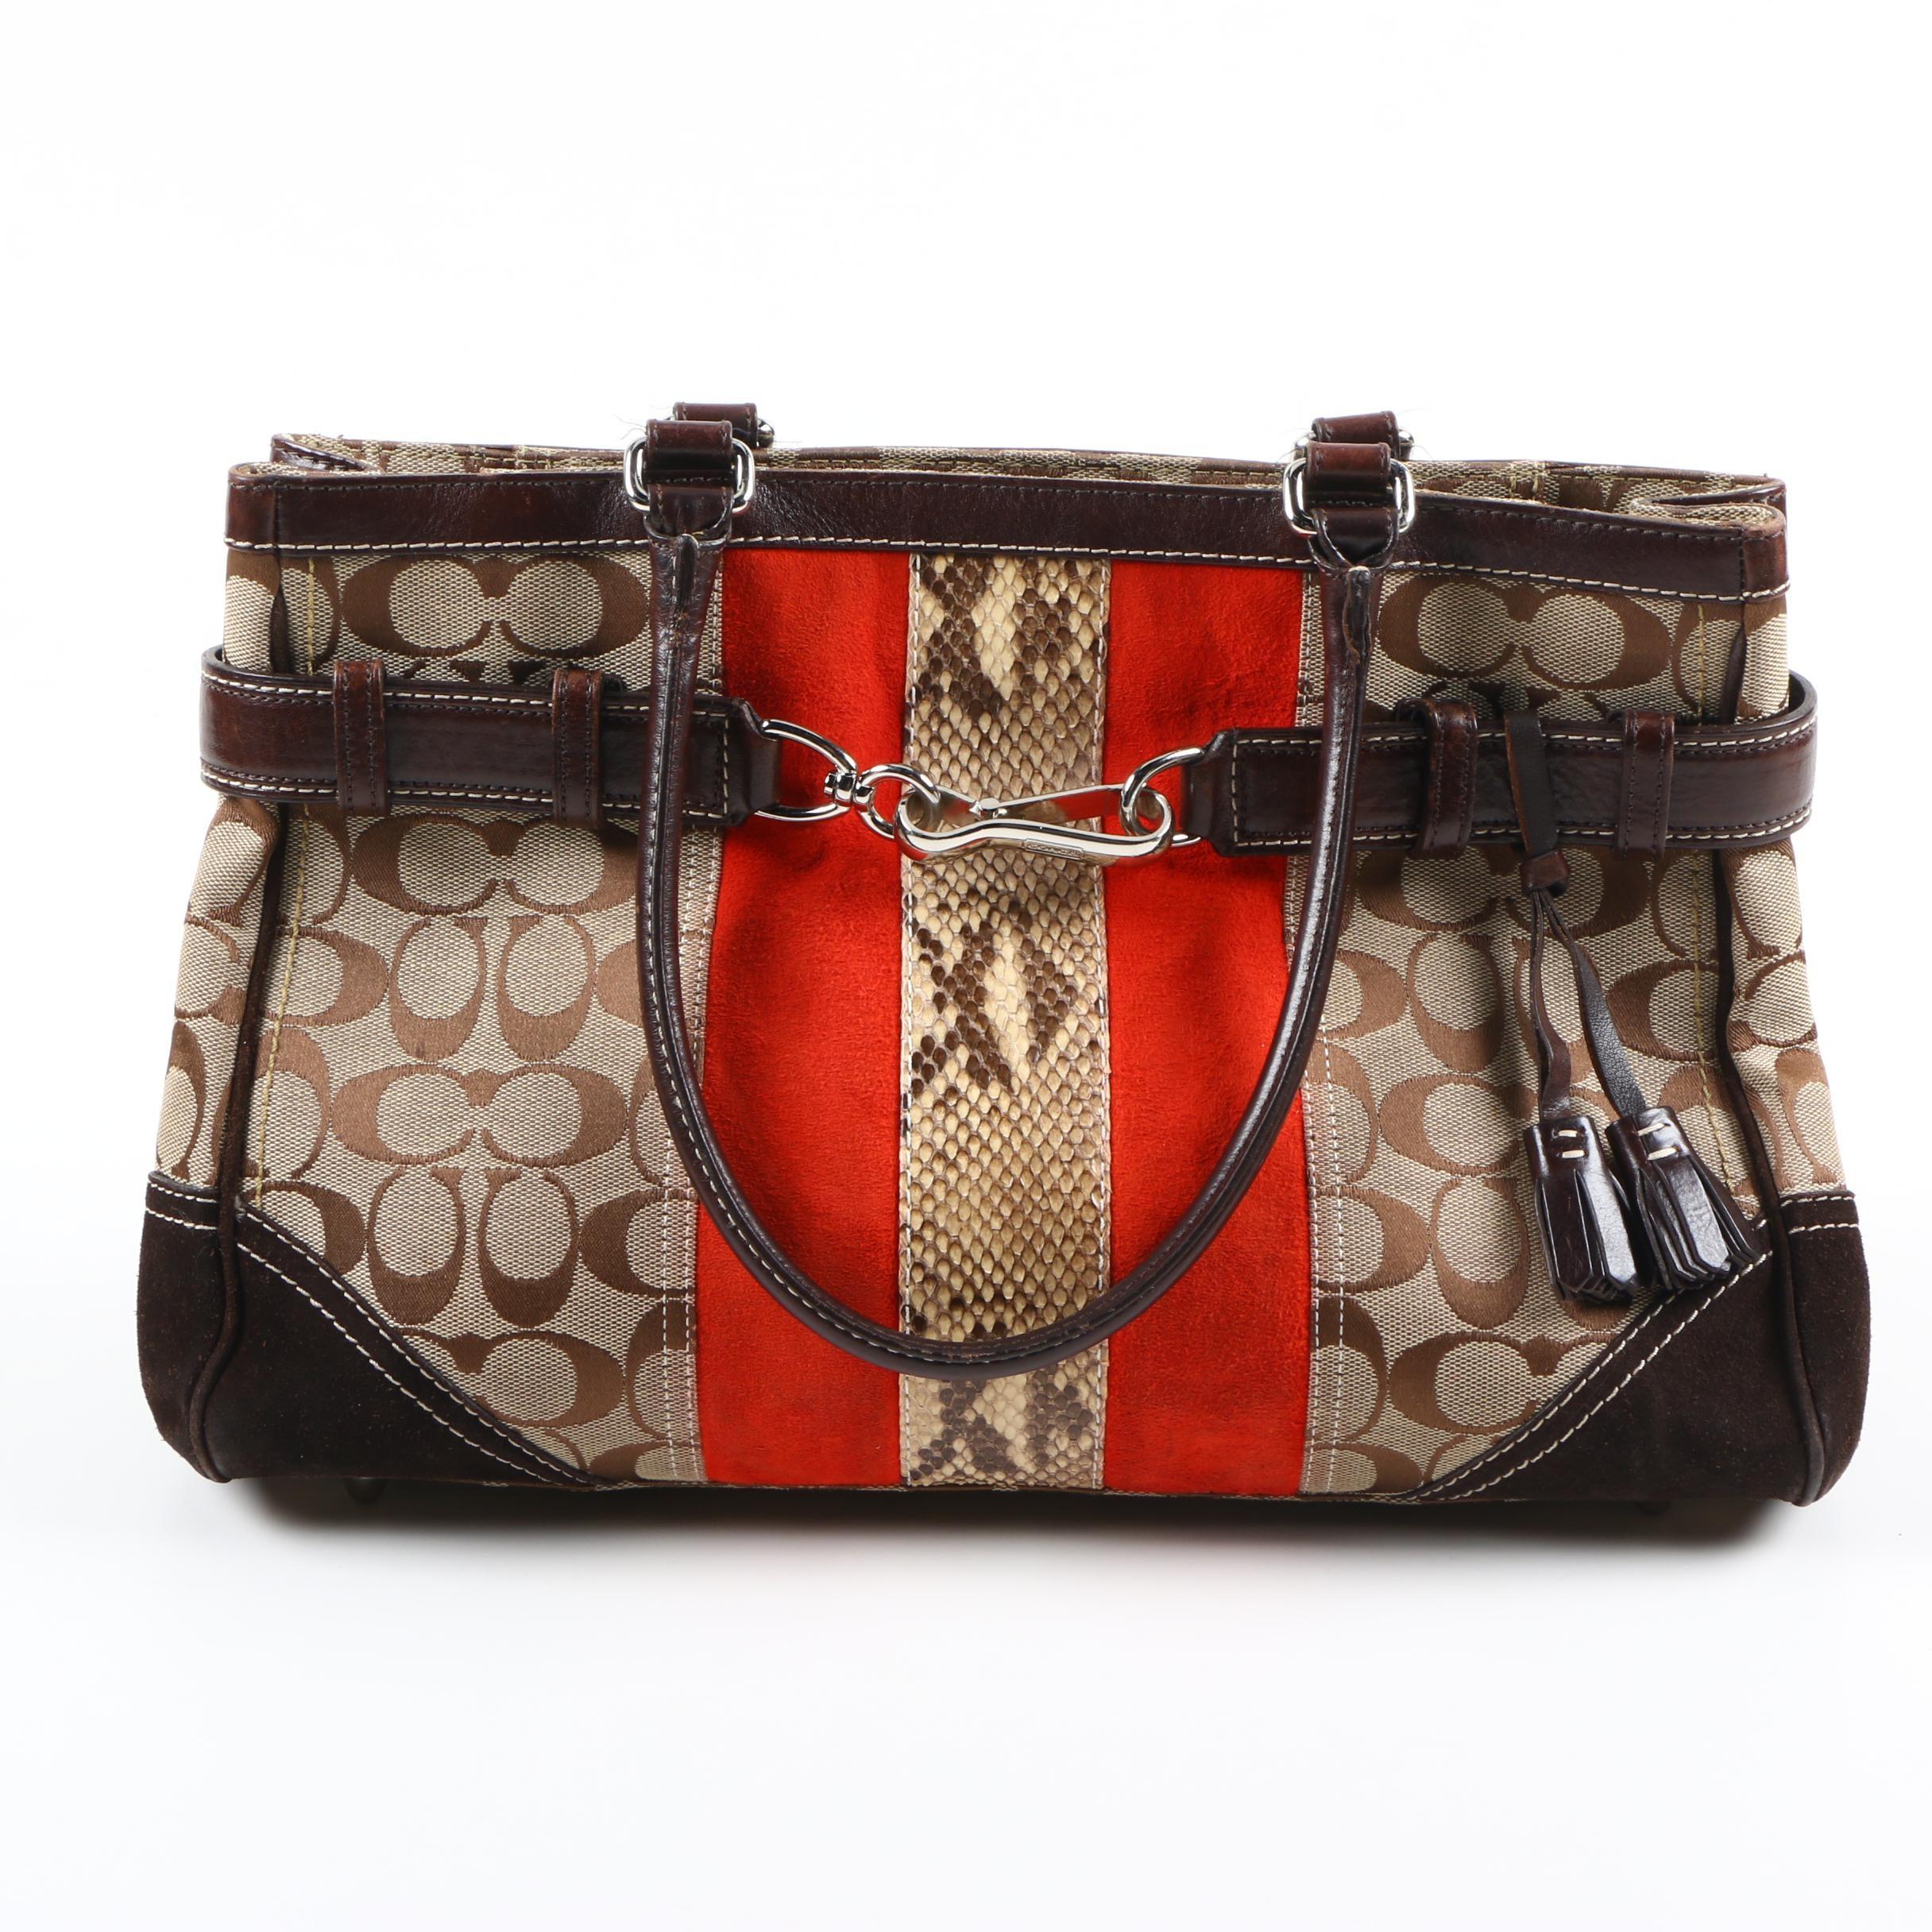 Coach Hamptons Signature Stripe Python Handbag Vintage Designer Handbags  Purse Auctions In Fashion Home